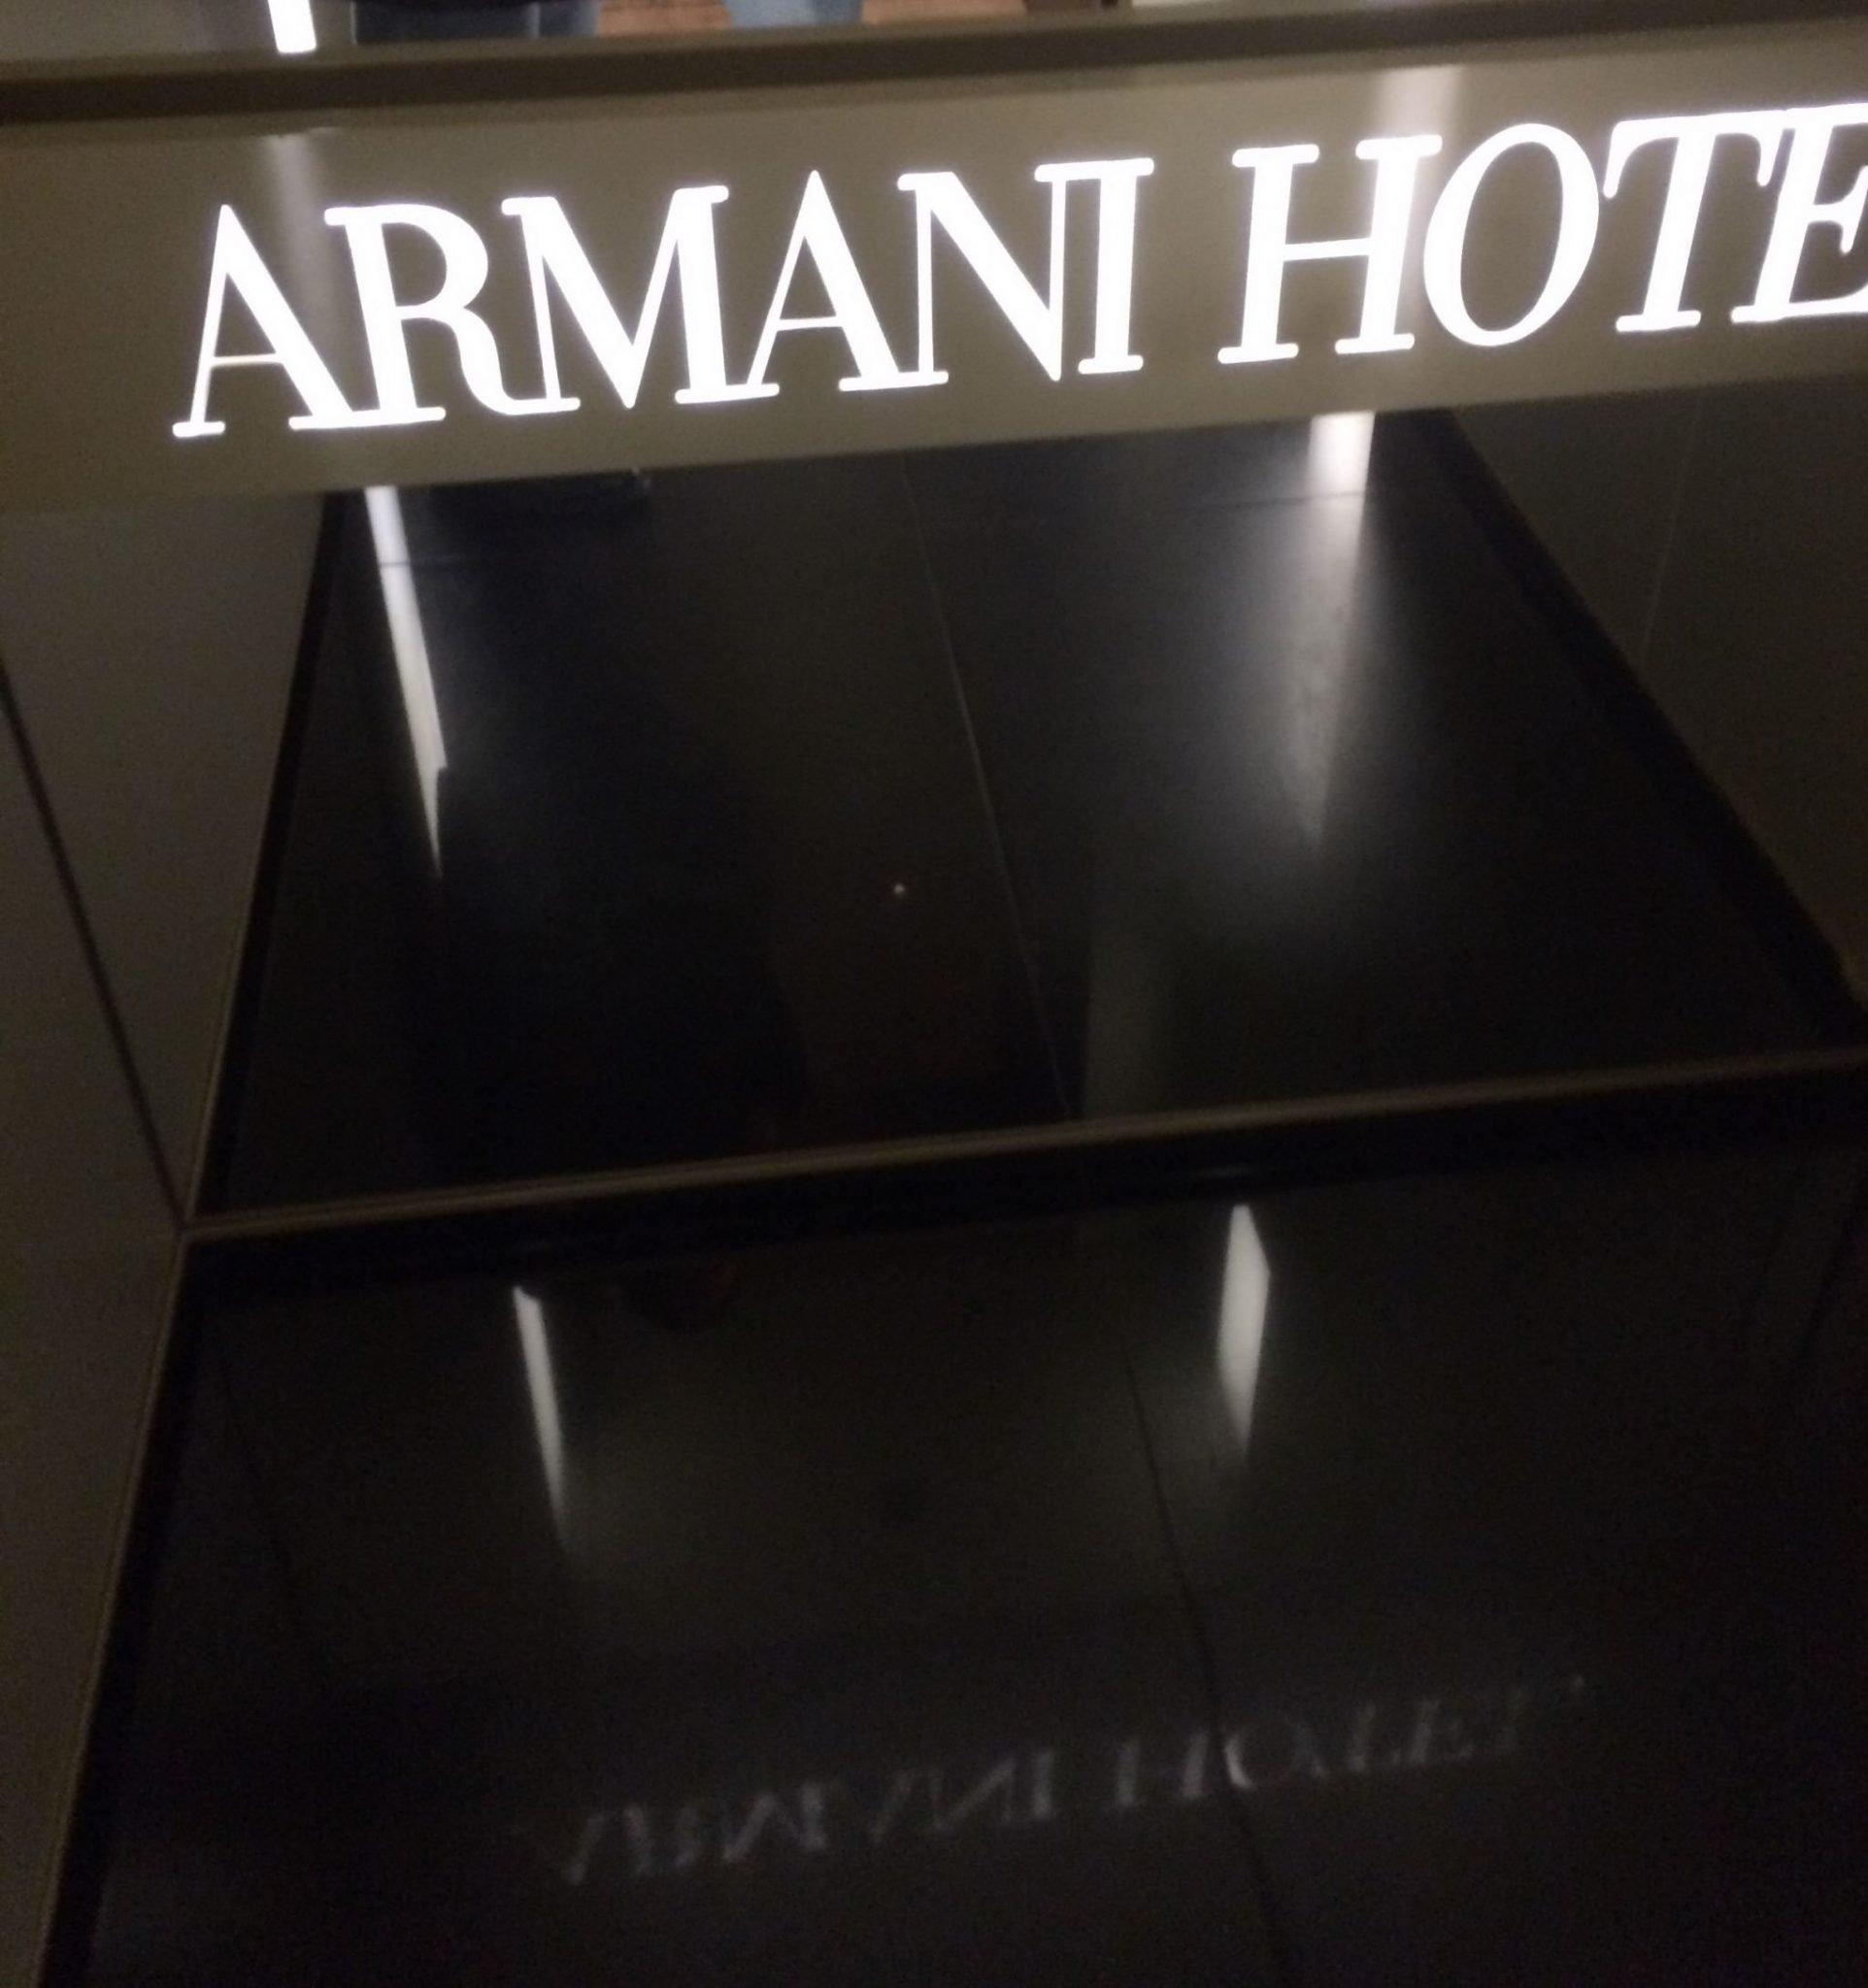 Armani Milan: a trendy drink